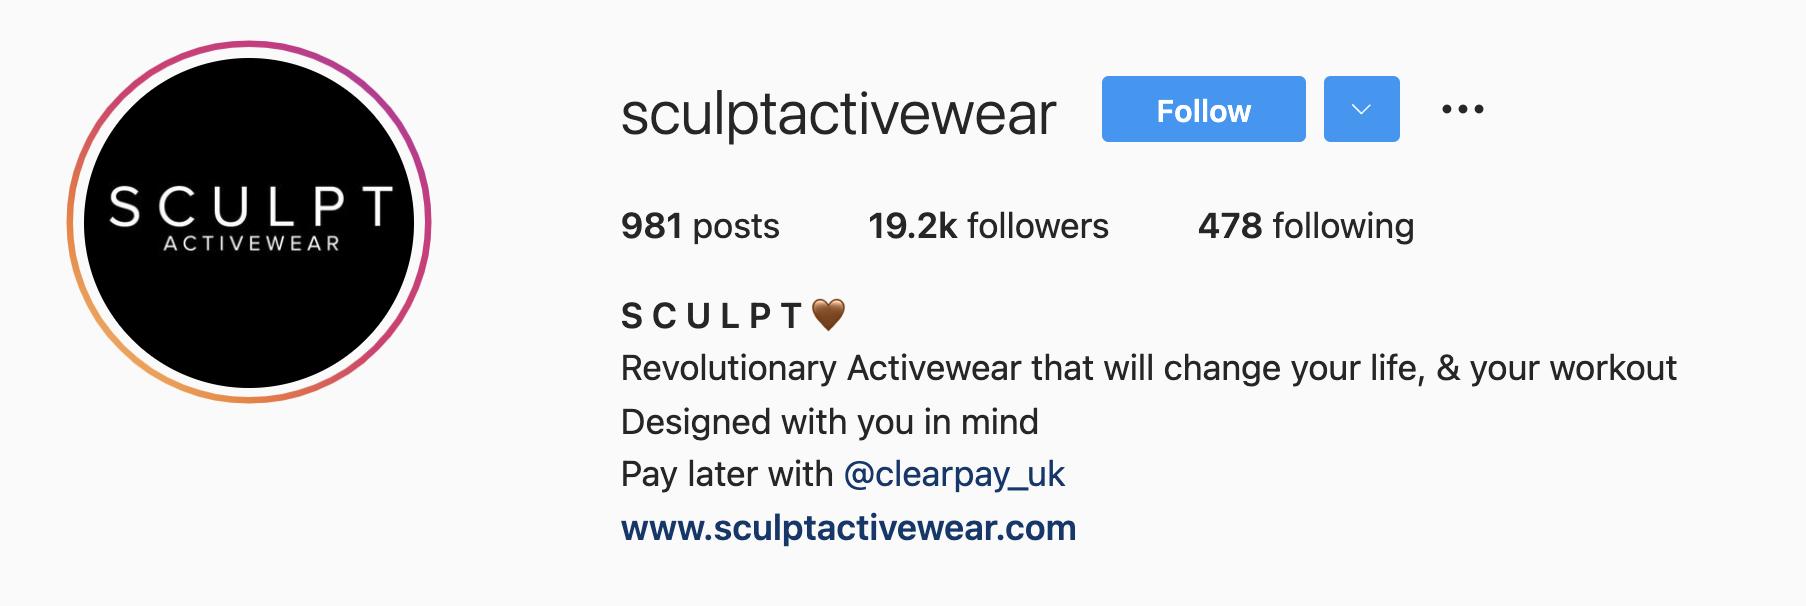 how to optimize instagram bio